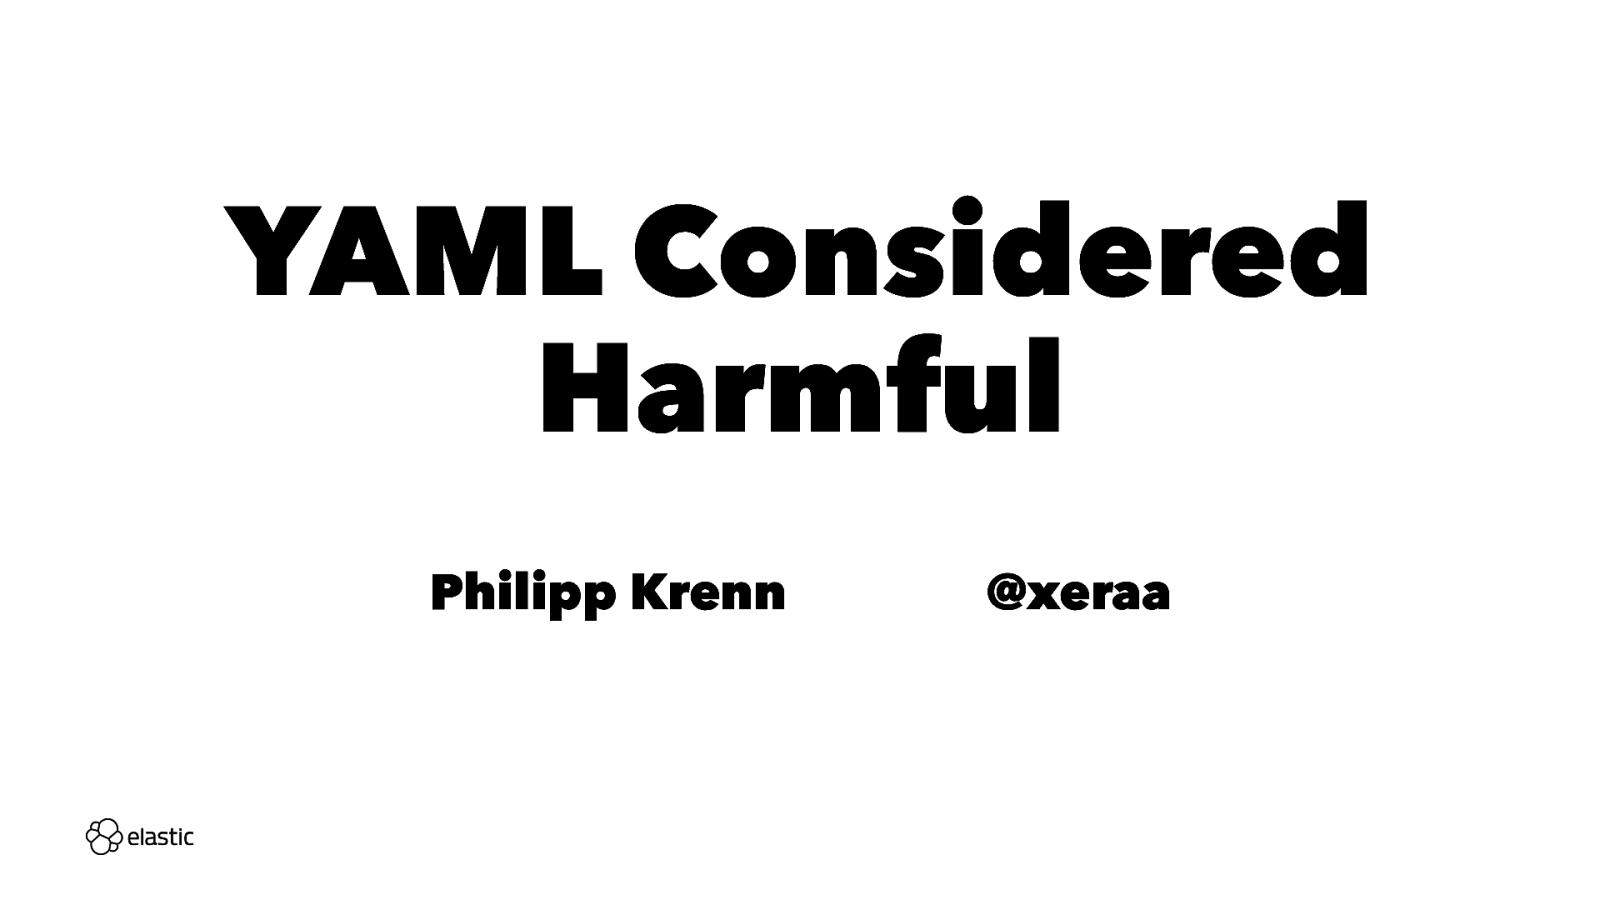 YAML Considered Harmful